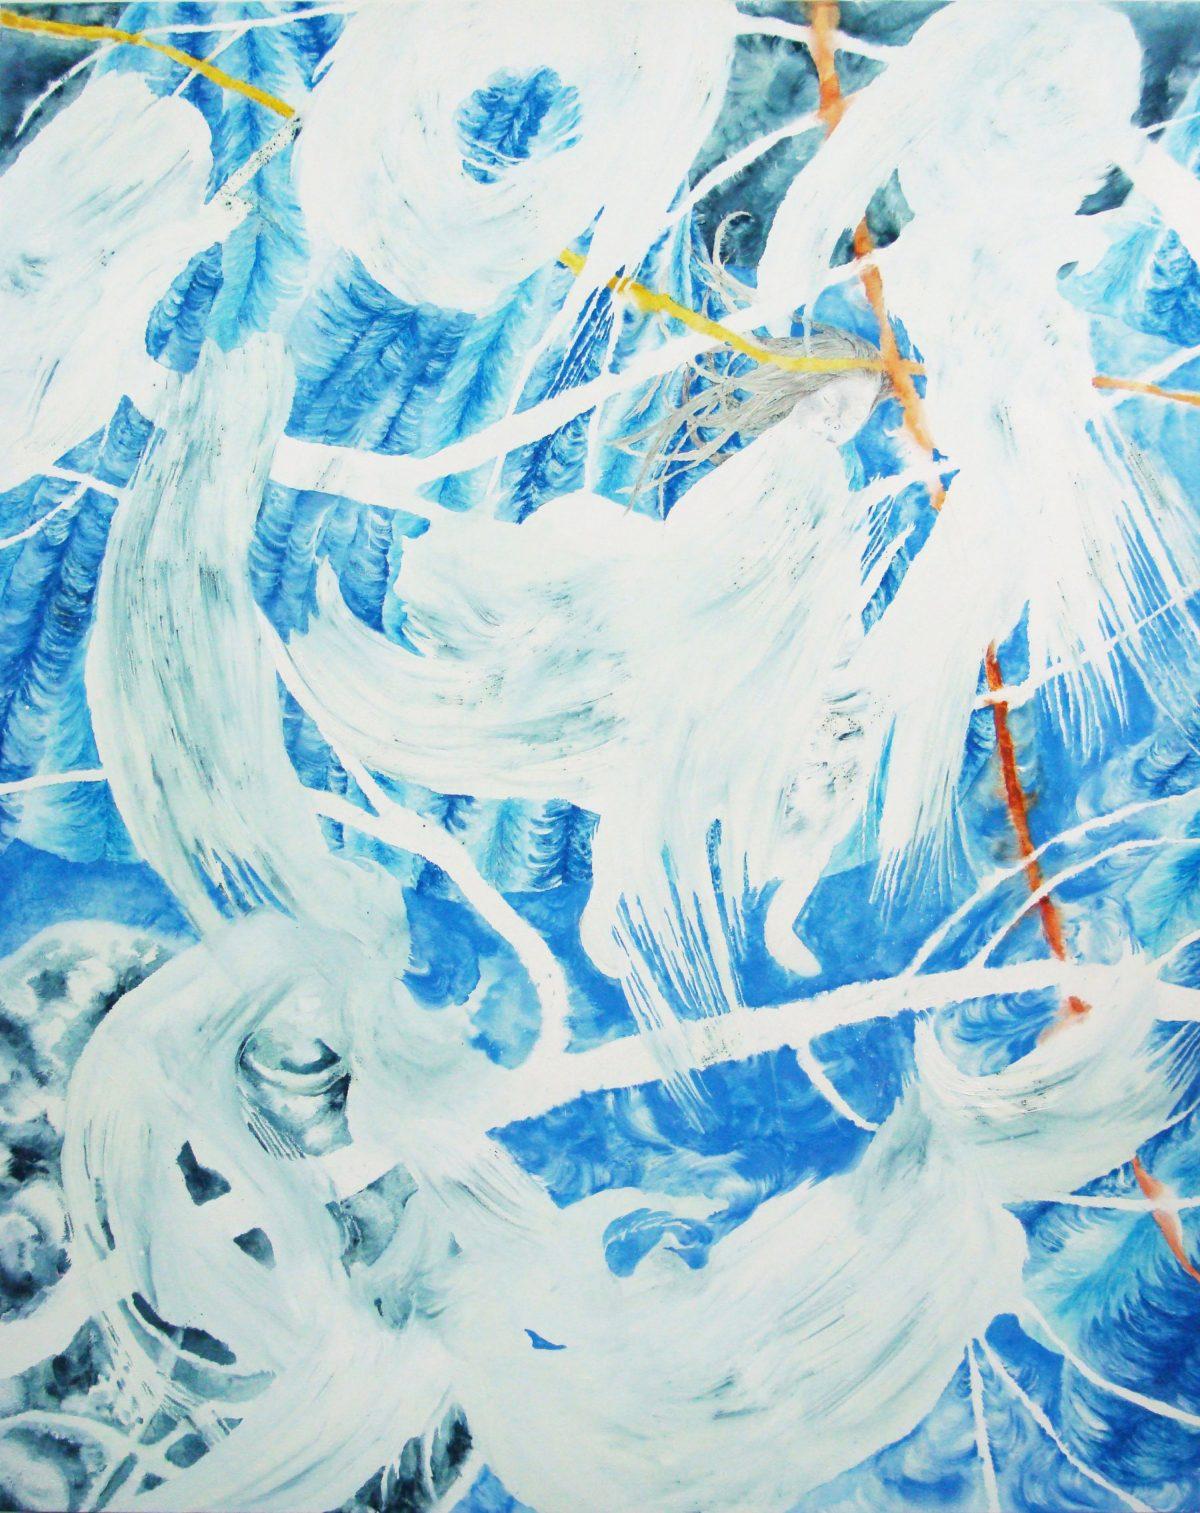 《White Coat》2009,230x190cm,綿布に油彩、色鉛筆